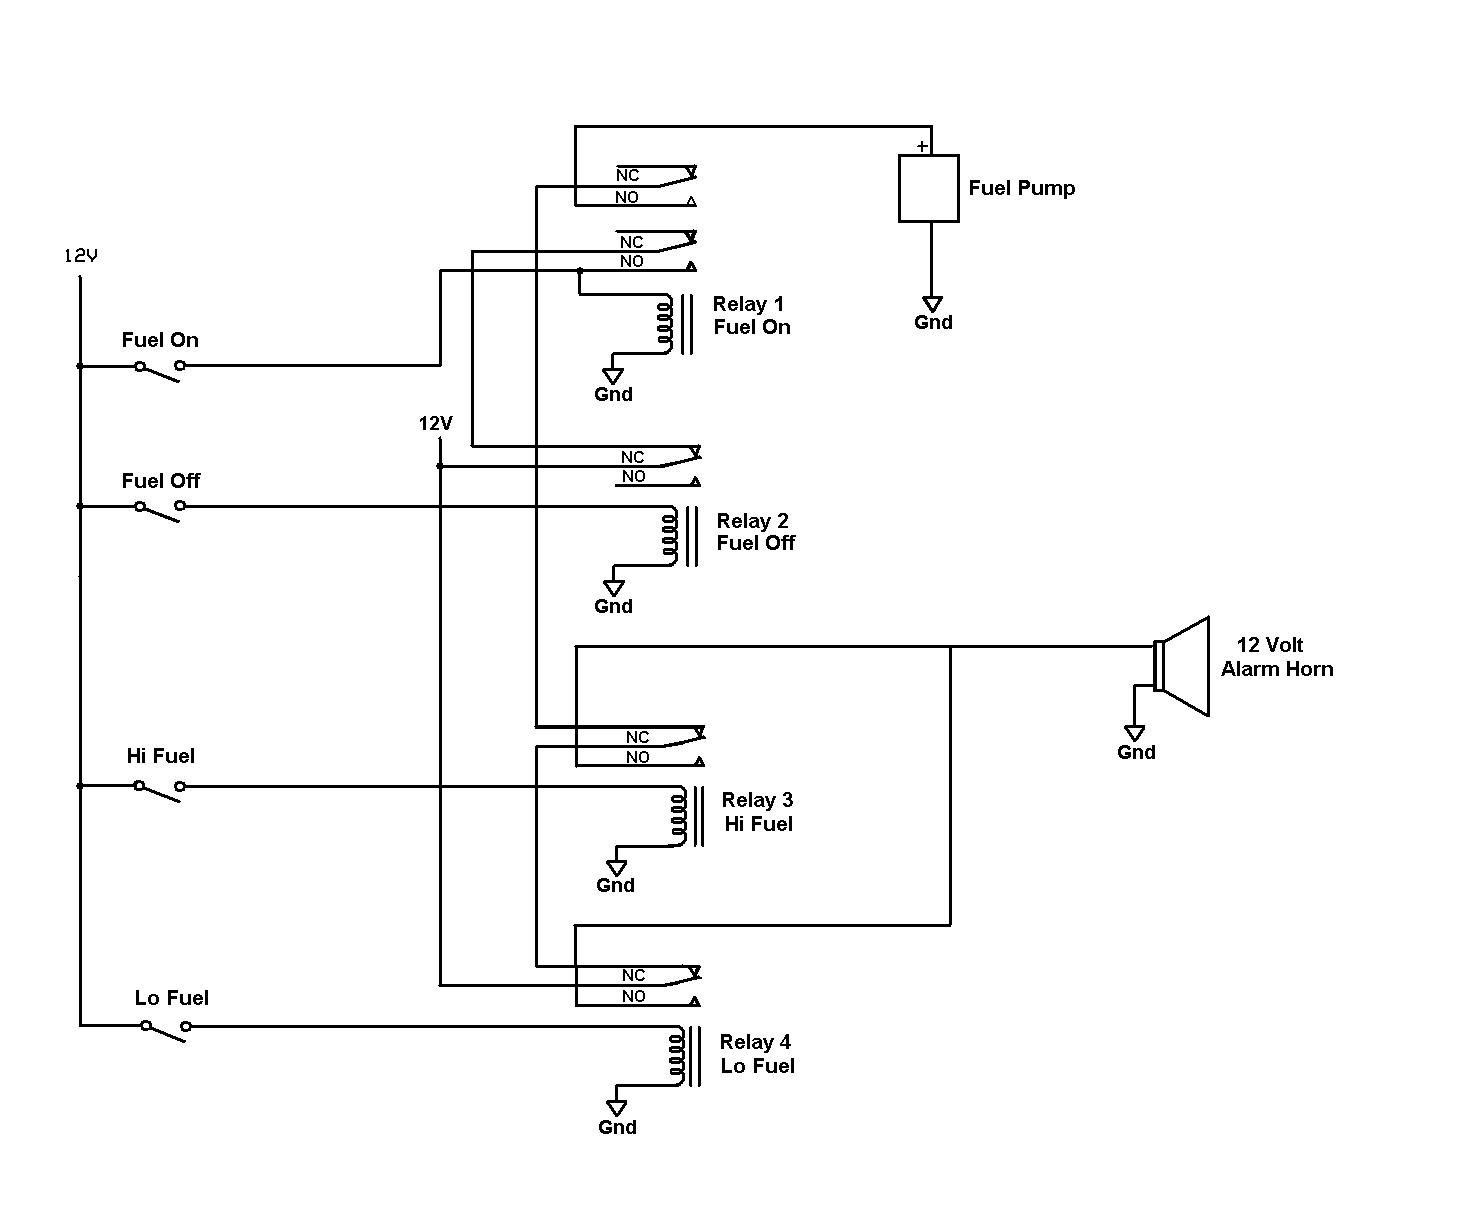 Figure 5. Basic Controller Schematic